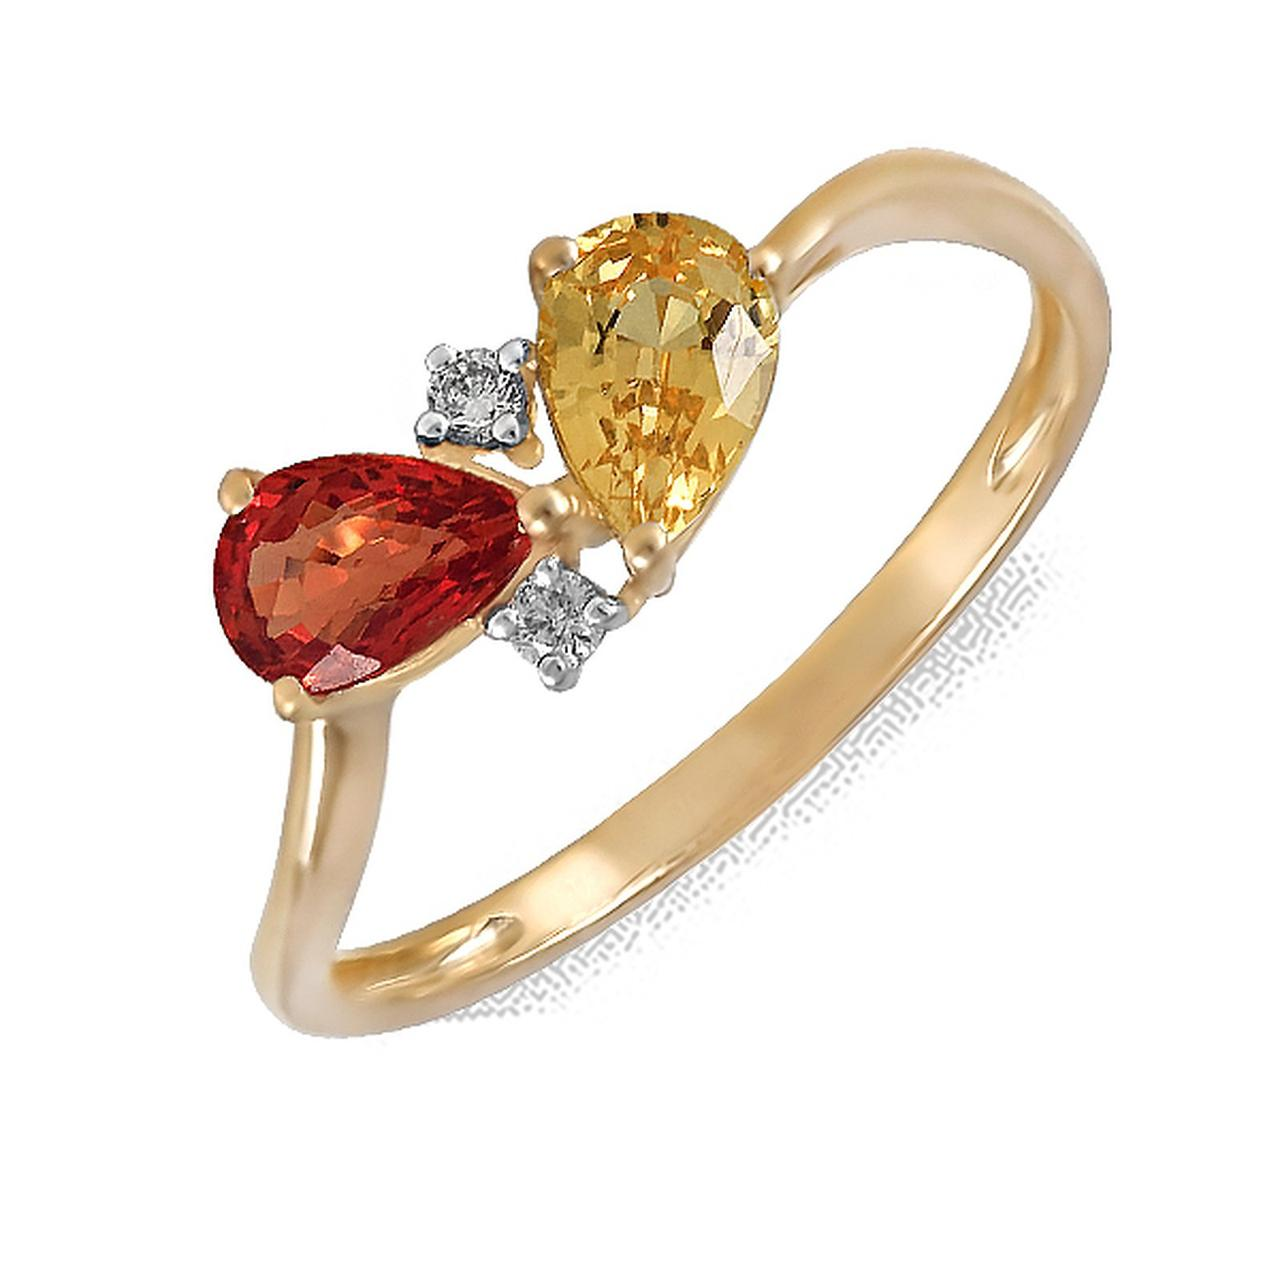 Золотое кольцо с бриллиантами и сапфирами, размер 16 (161852)